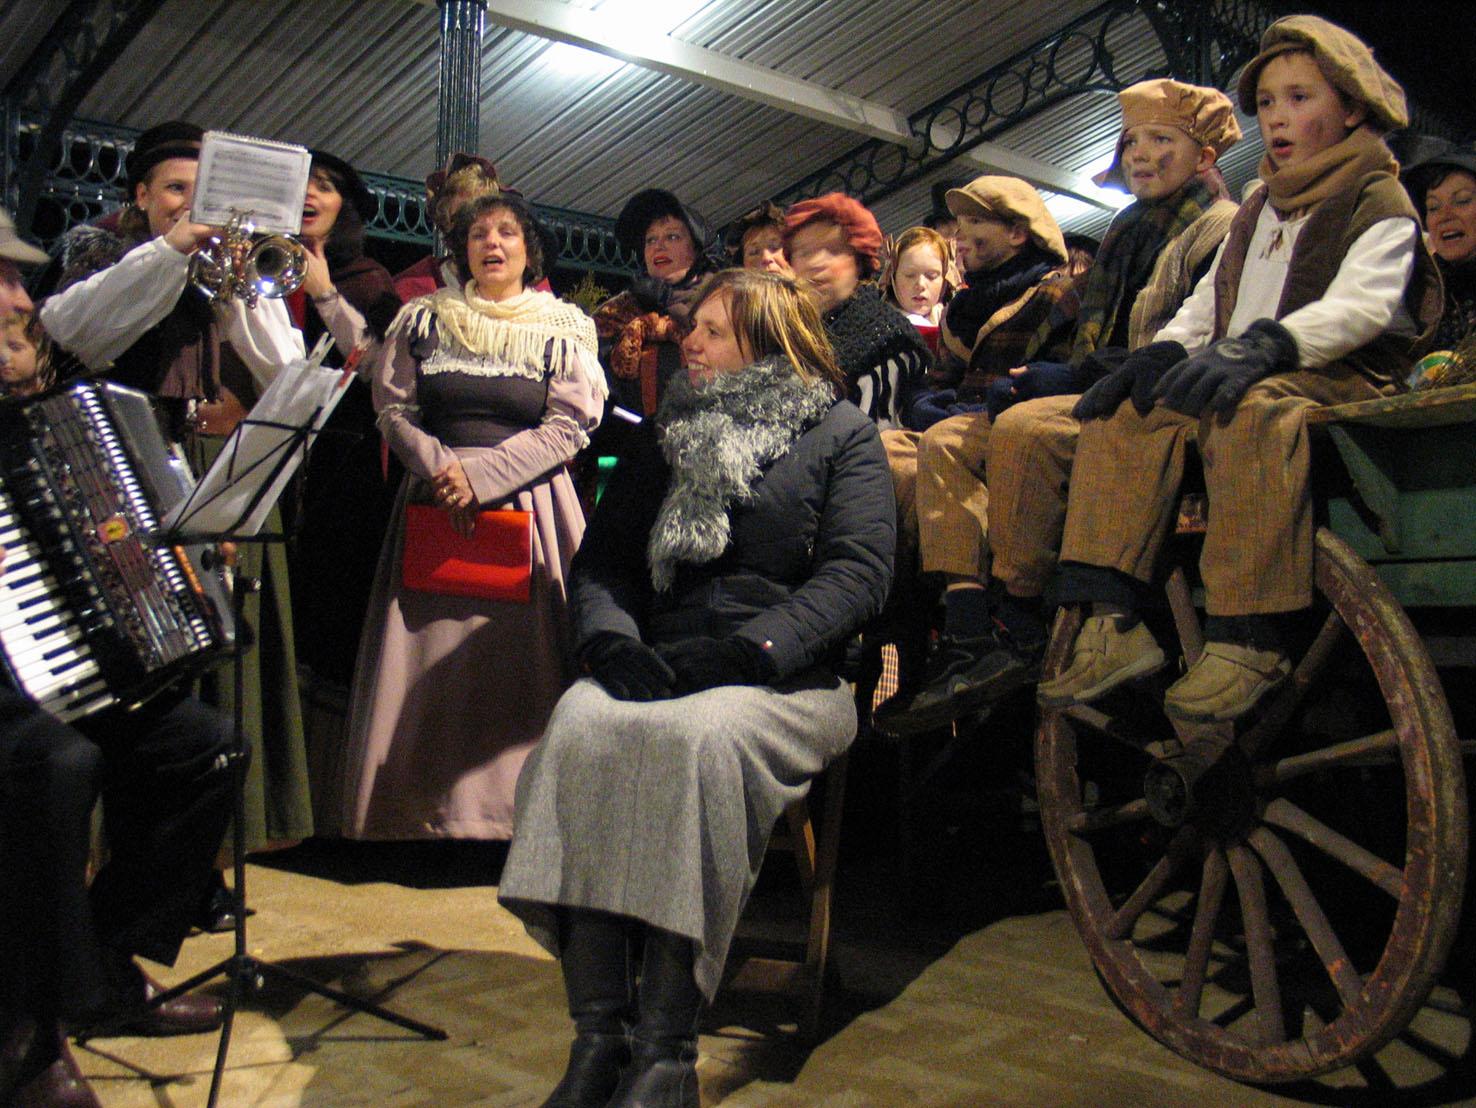 119 - Kerstmarkt Helmond 2003.jpg